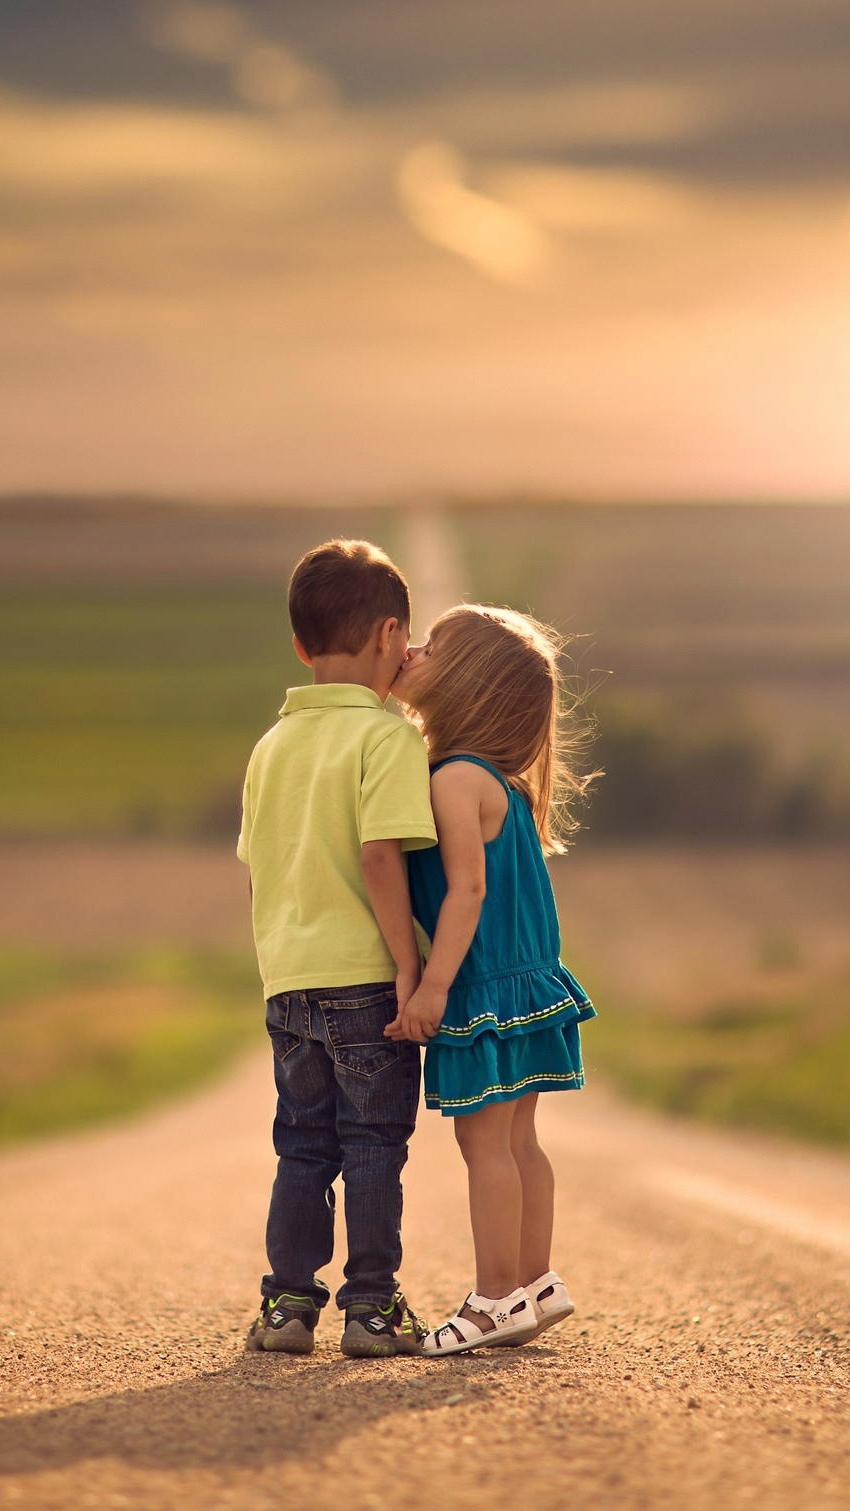 Cute Kids Kiss iPhone Wallpaper iphoneswallpapers com